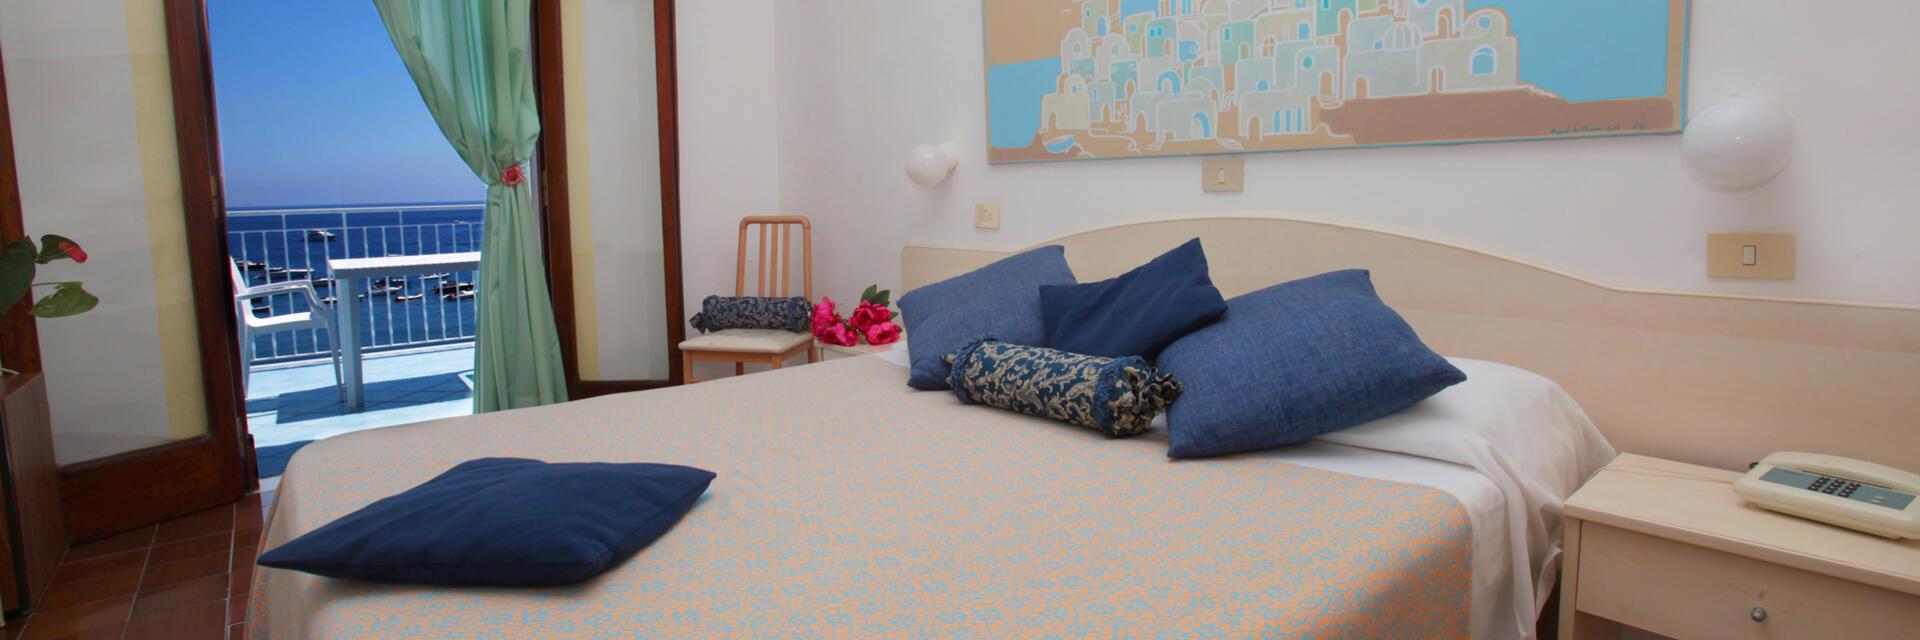 hotelcasarosaterme it camere 002